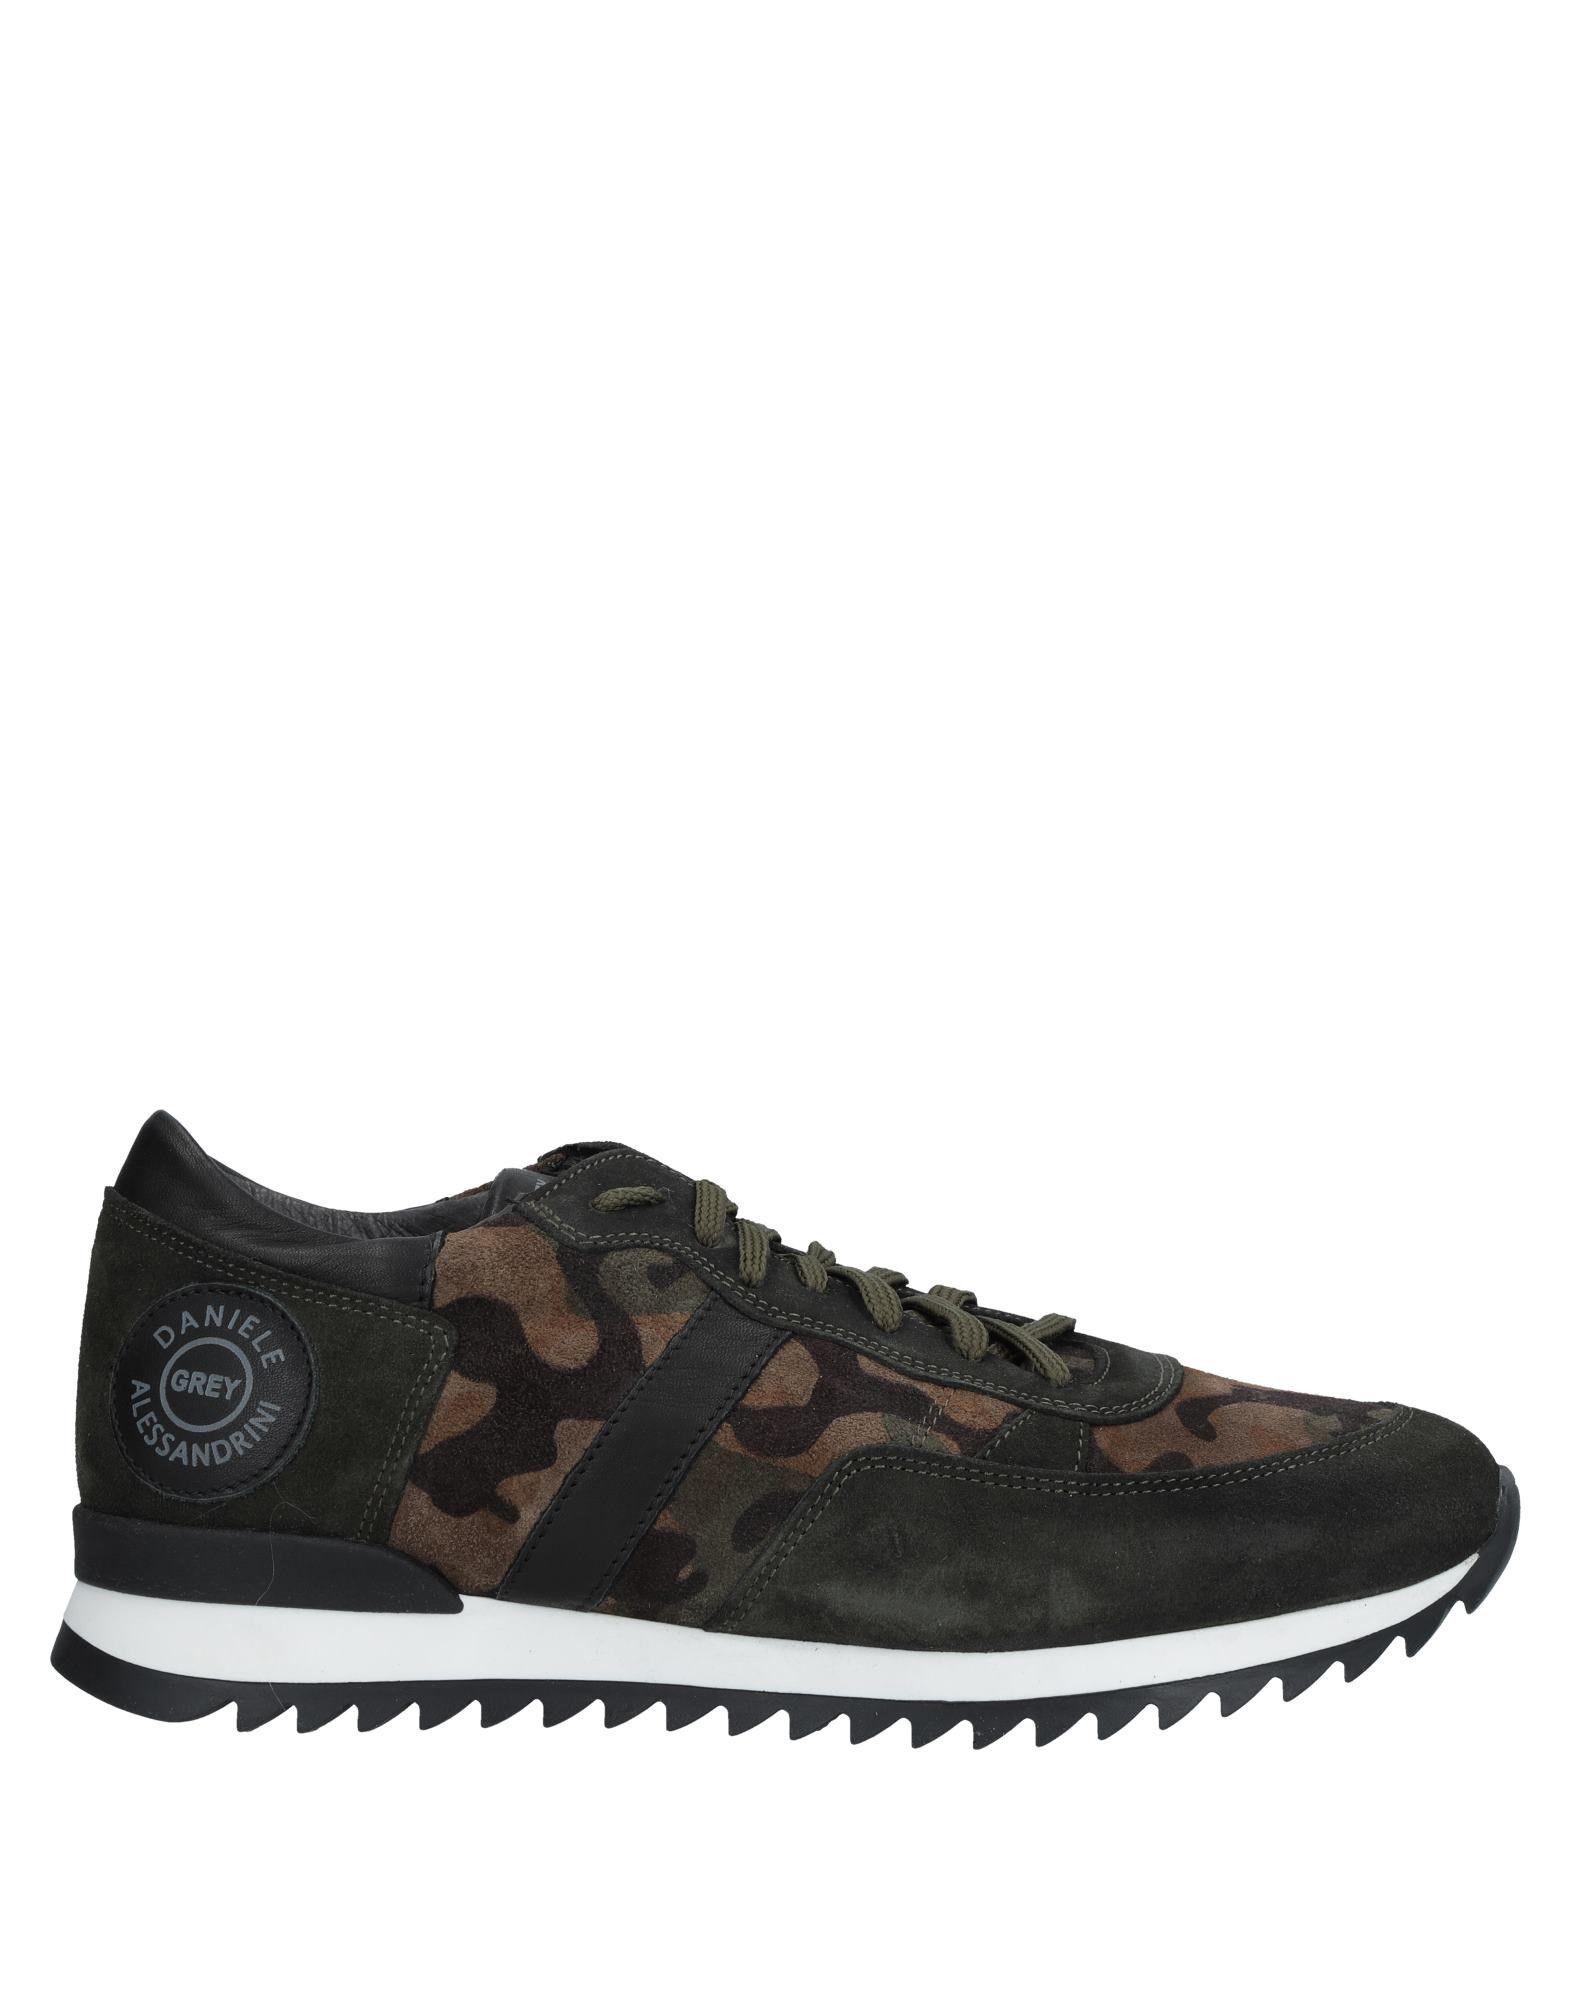 Daniele Alessandrini Herren Sneakers Herren Alessandrini  11531626PM 07df37